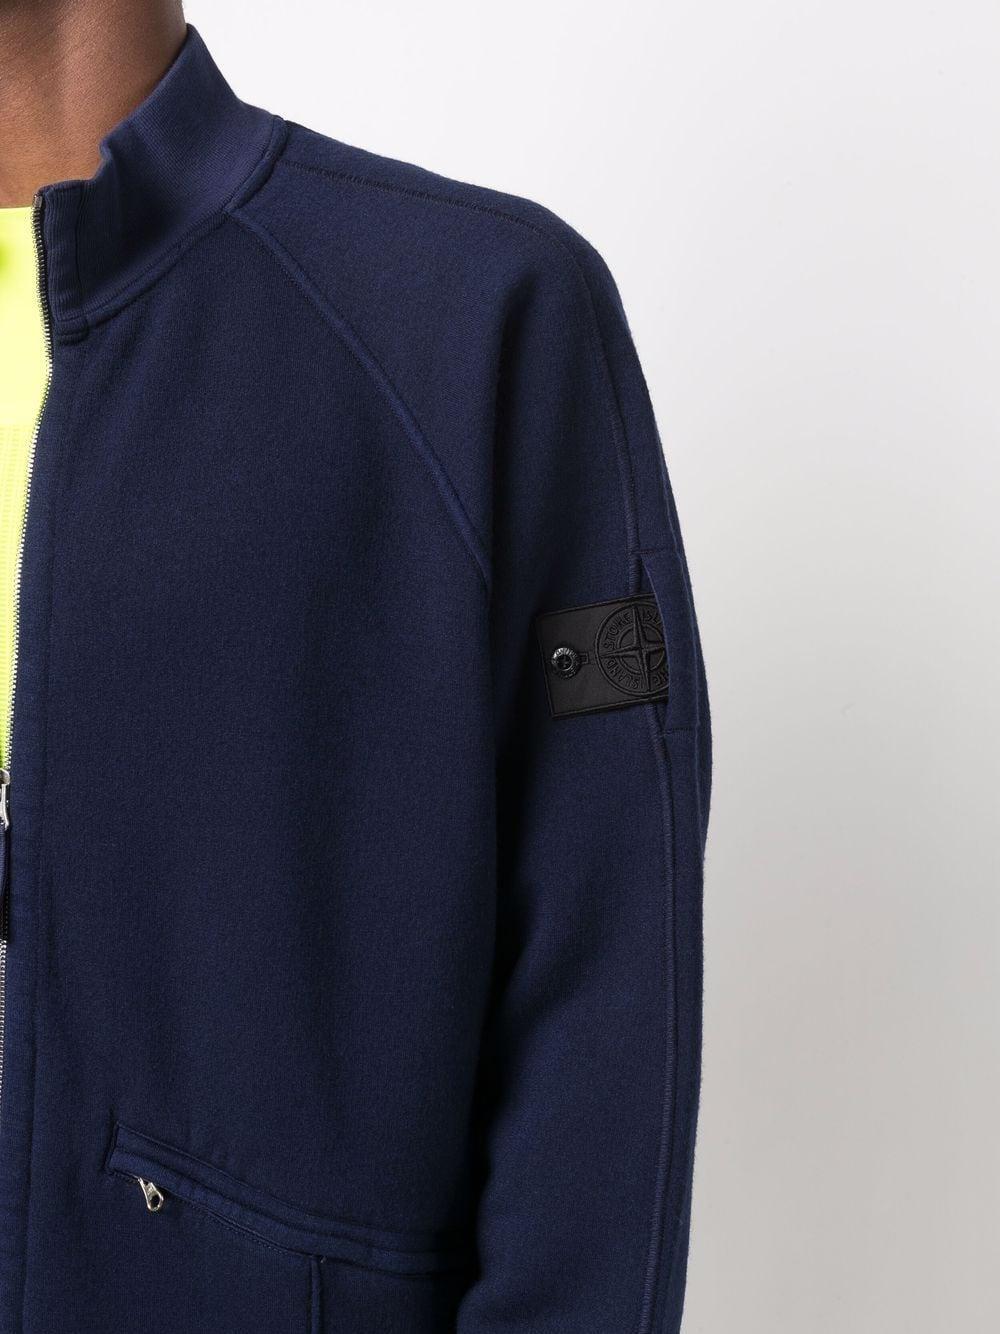 blended wool jacket man blue STONE ISLAND SHADOW PROJECT | Jackets | 751960310V1027